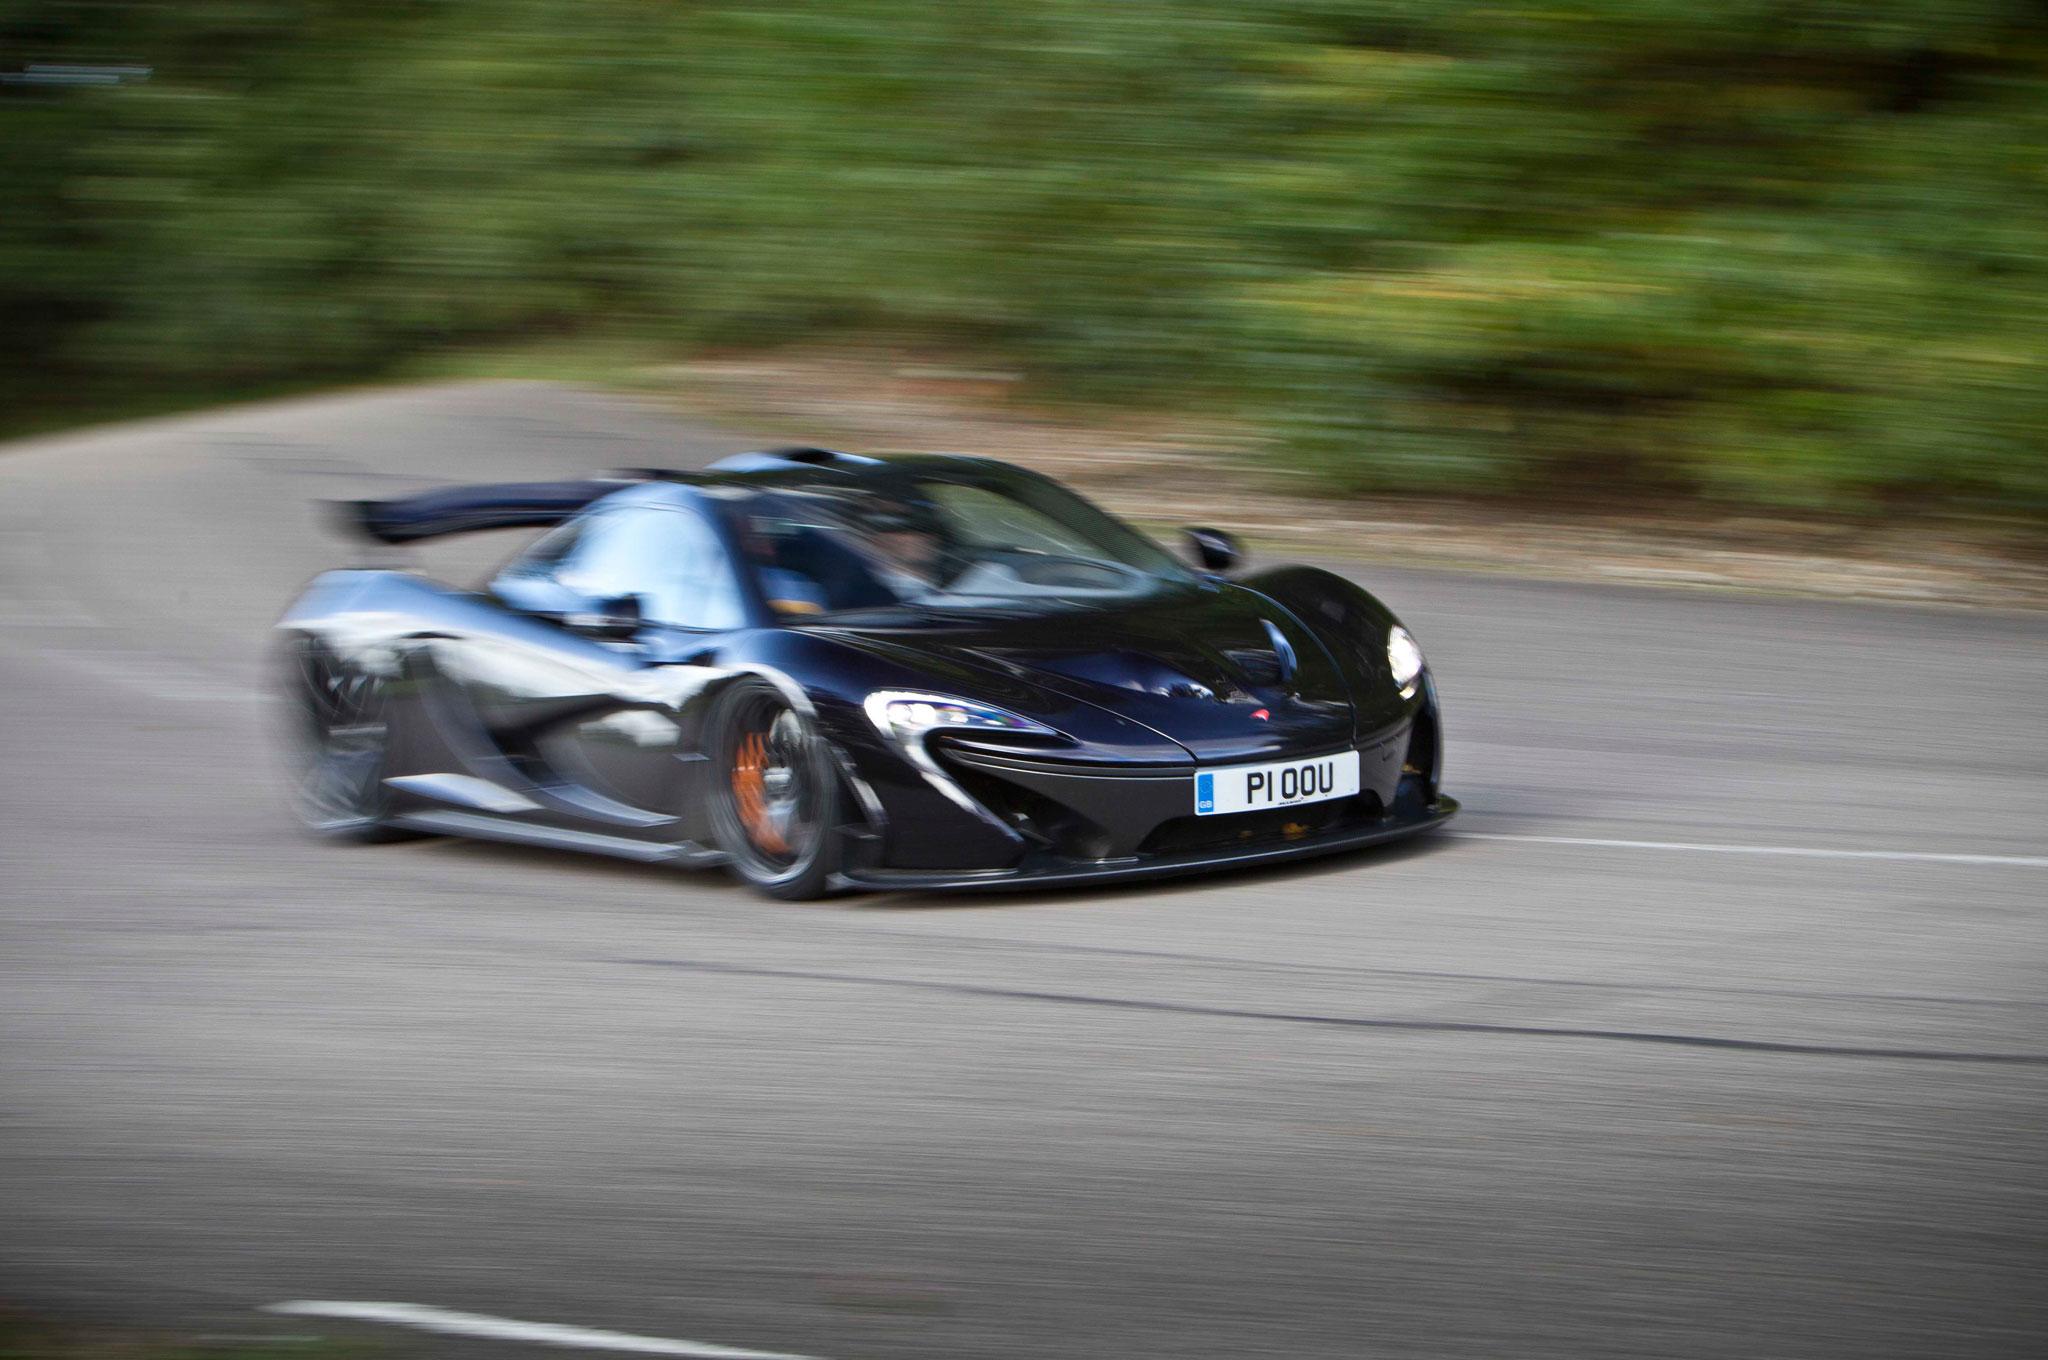 http://st.automobilemag.com/uploads/sites/11/2014/07/2014-Mclaren-P1-front-right-view.jpg